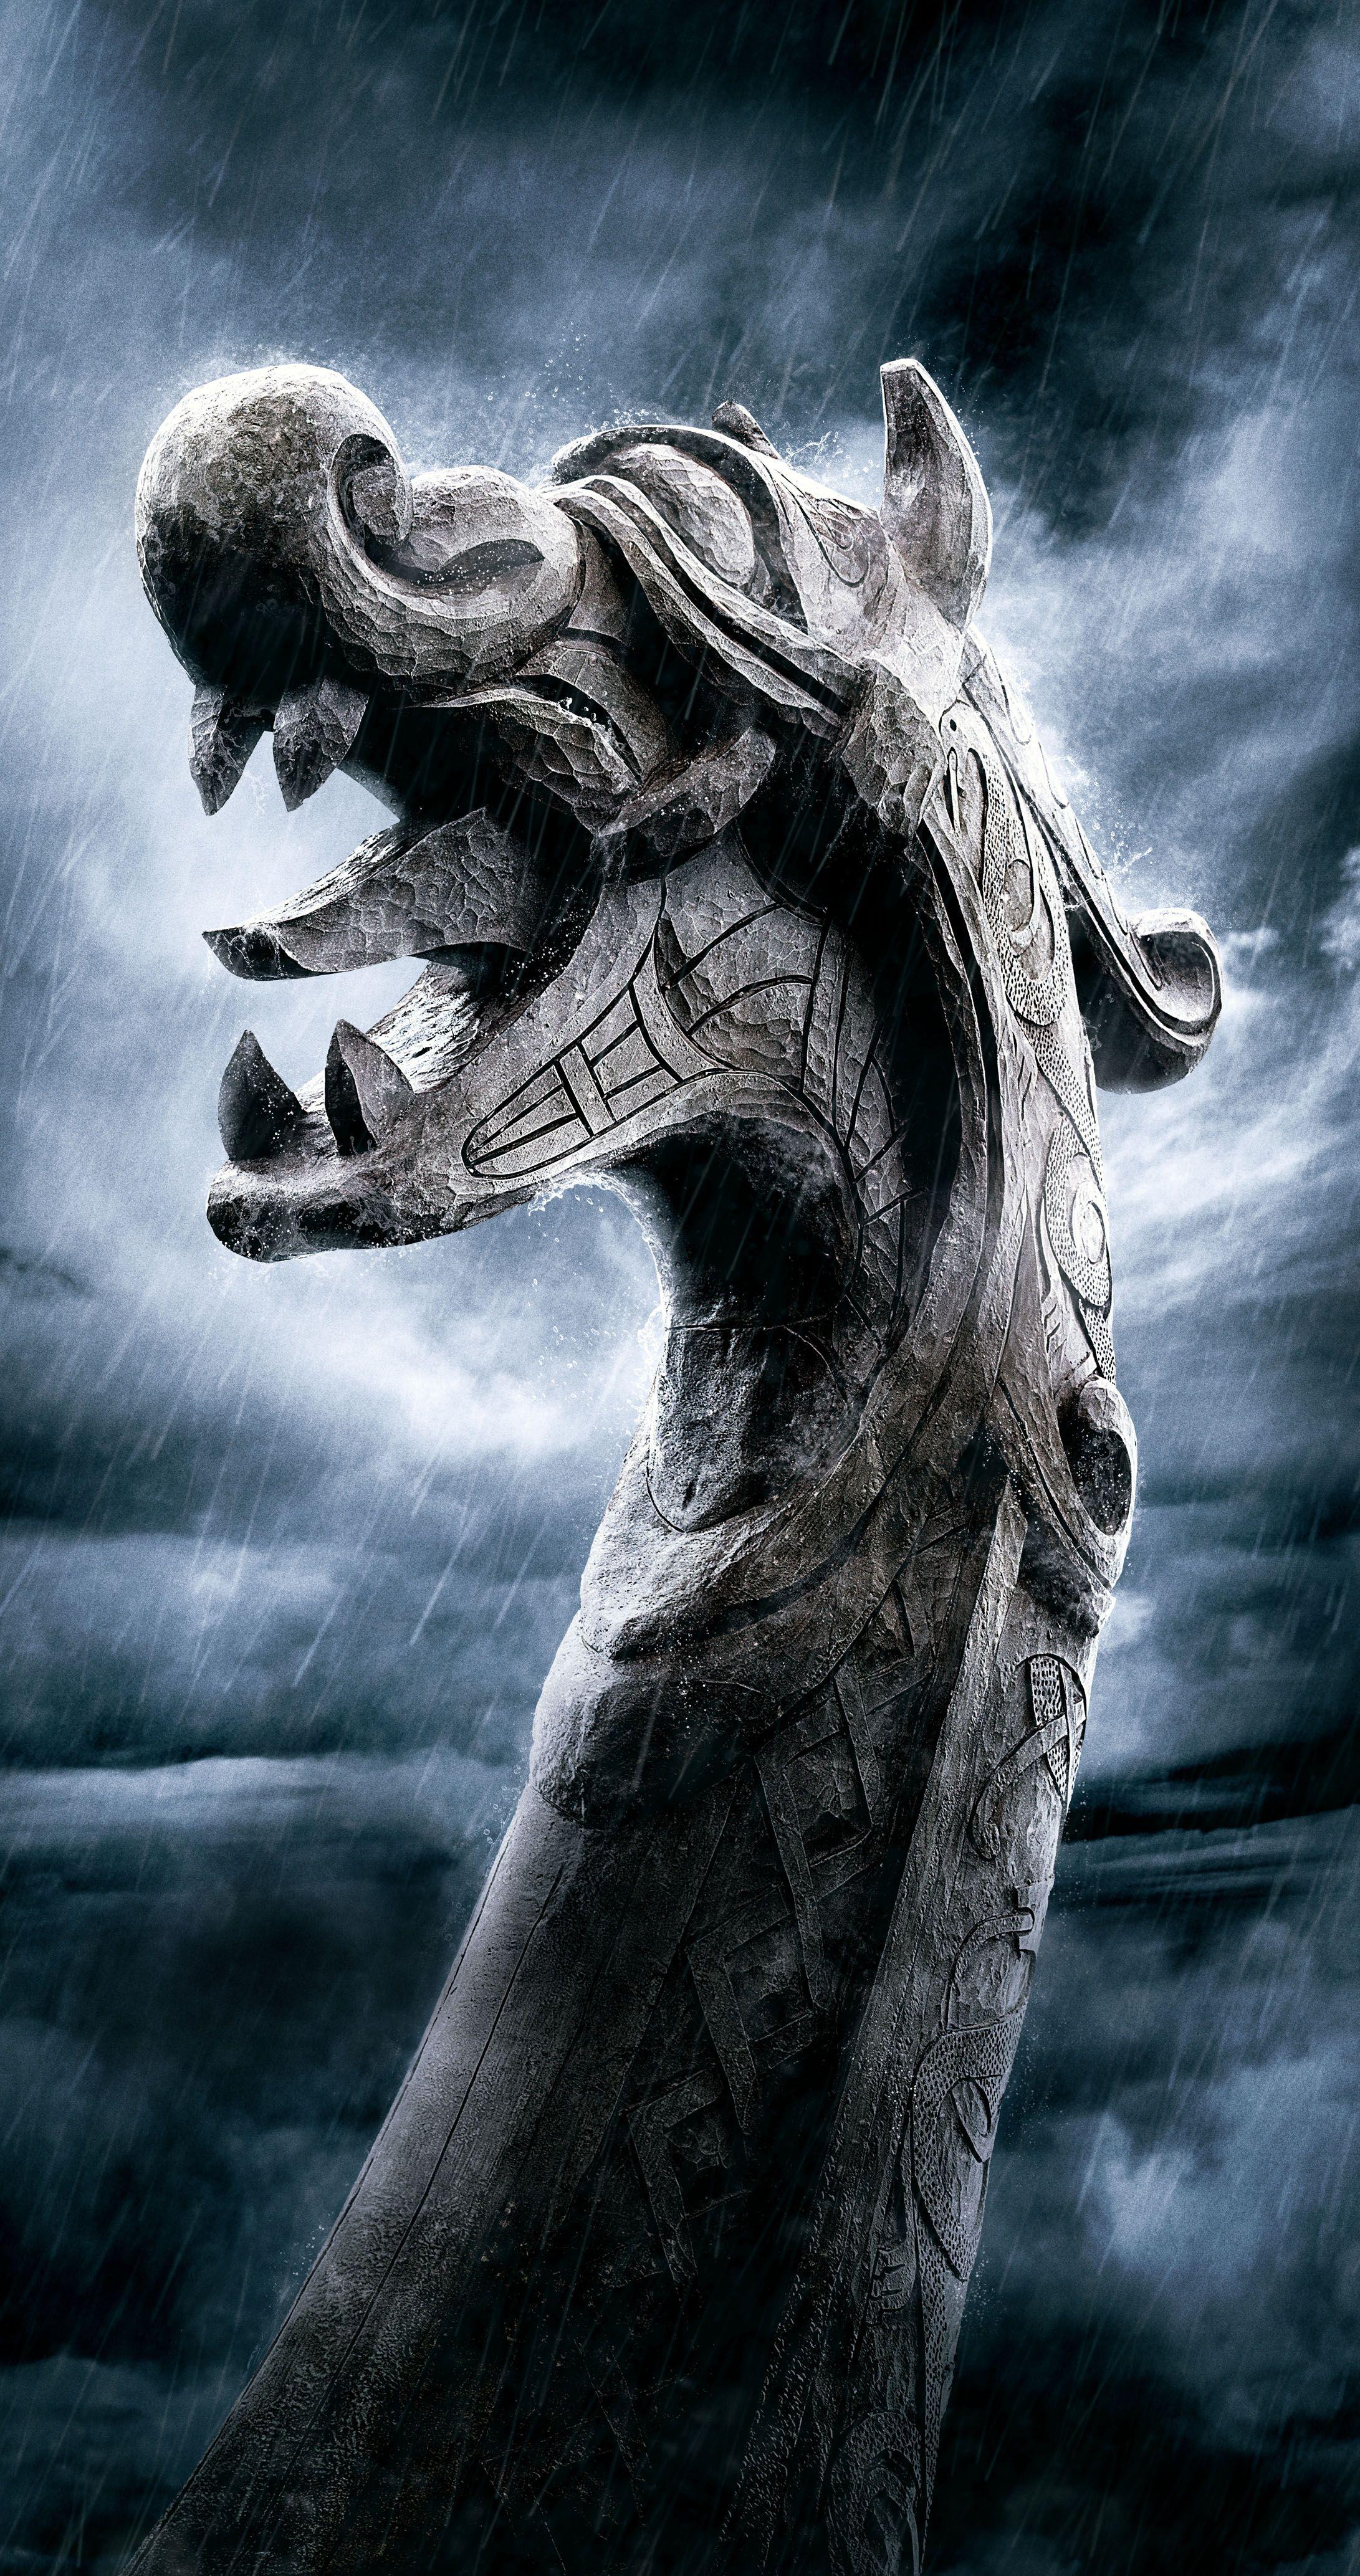 Vikings S1 Promotional Poster Vikings, Viking wallpaper